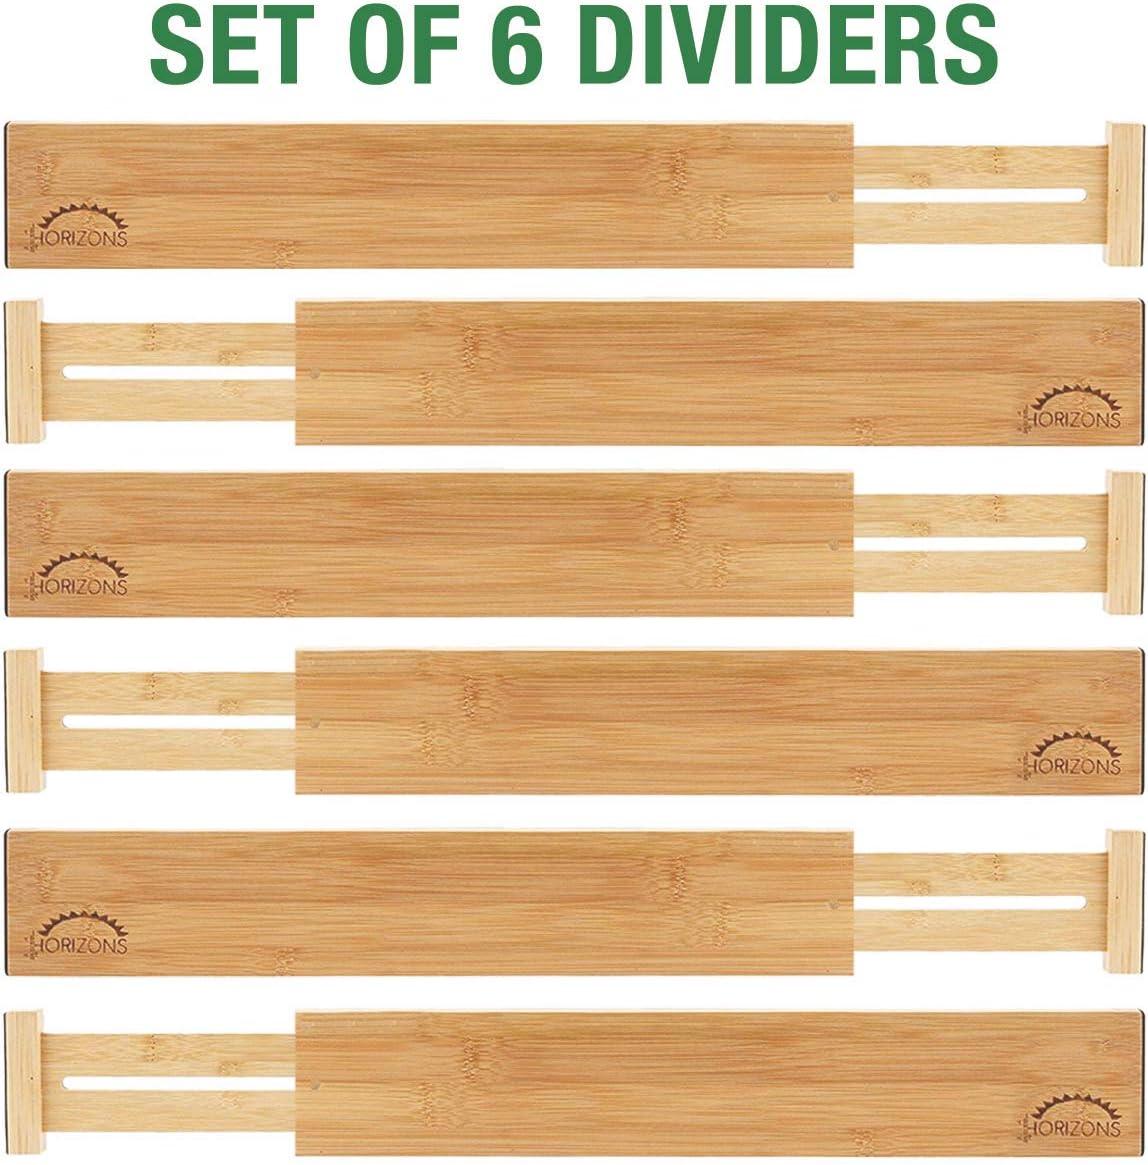 Bamboo Drawer Dividers Set of 6 – Kitchen Drawer Organizers – Spring Adjustable, Expandable Stackable Deep Drawers Organizer – Best for Kitchen Utensils, Silverware, Desk, Clothes Dresser Divider